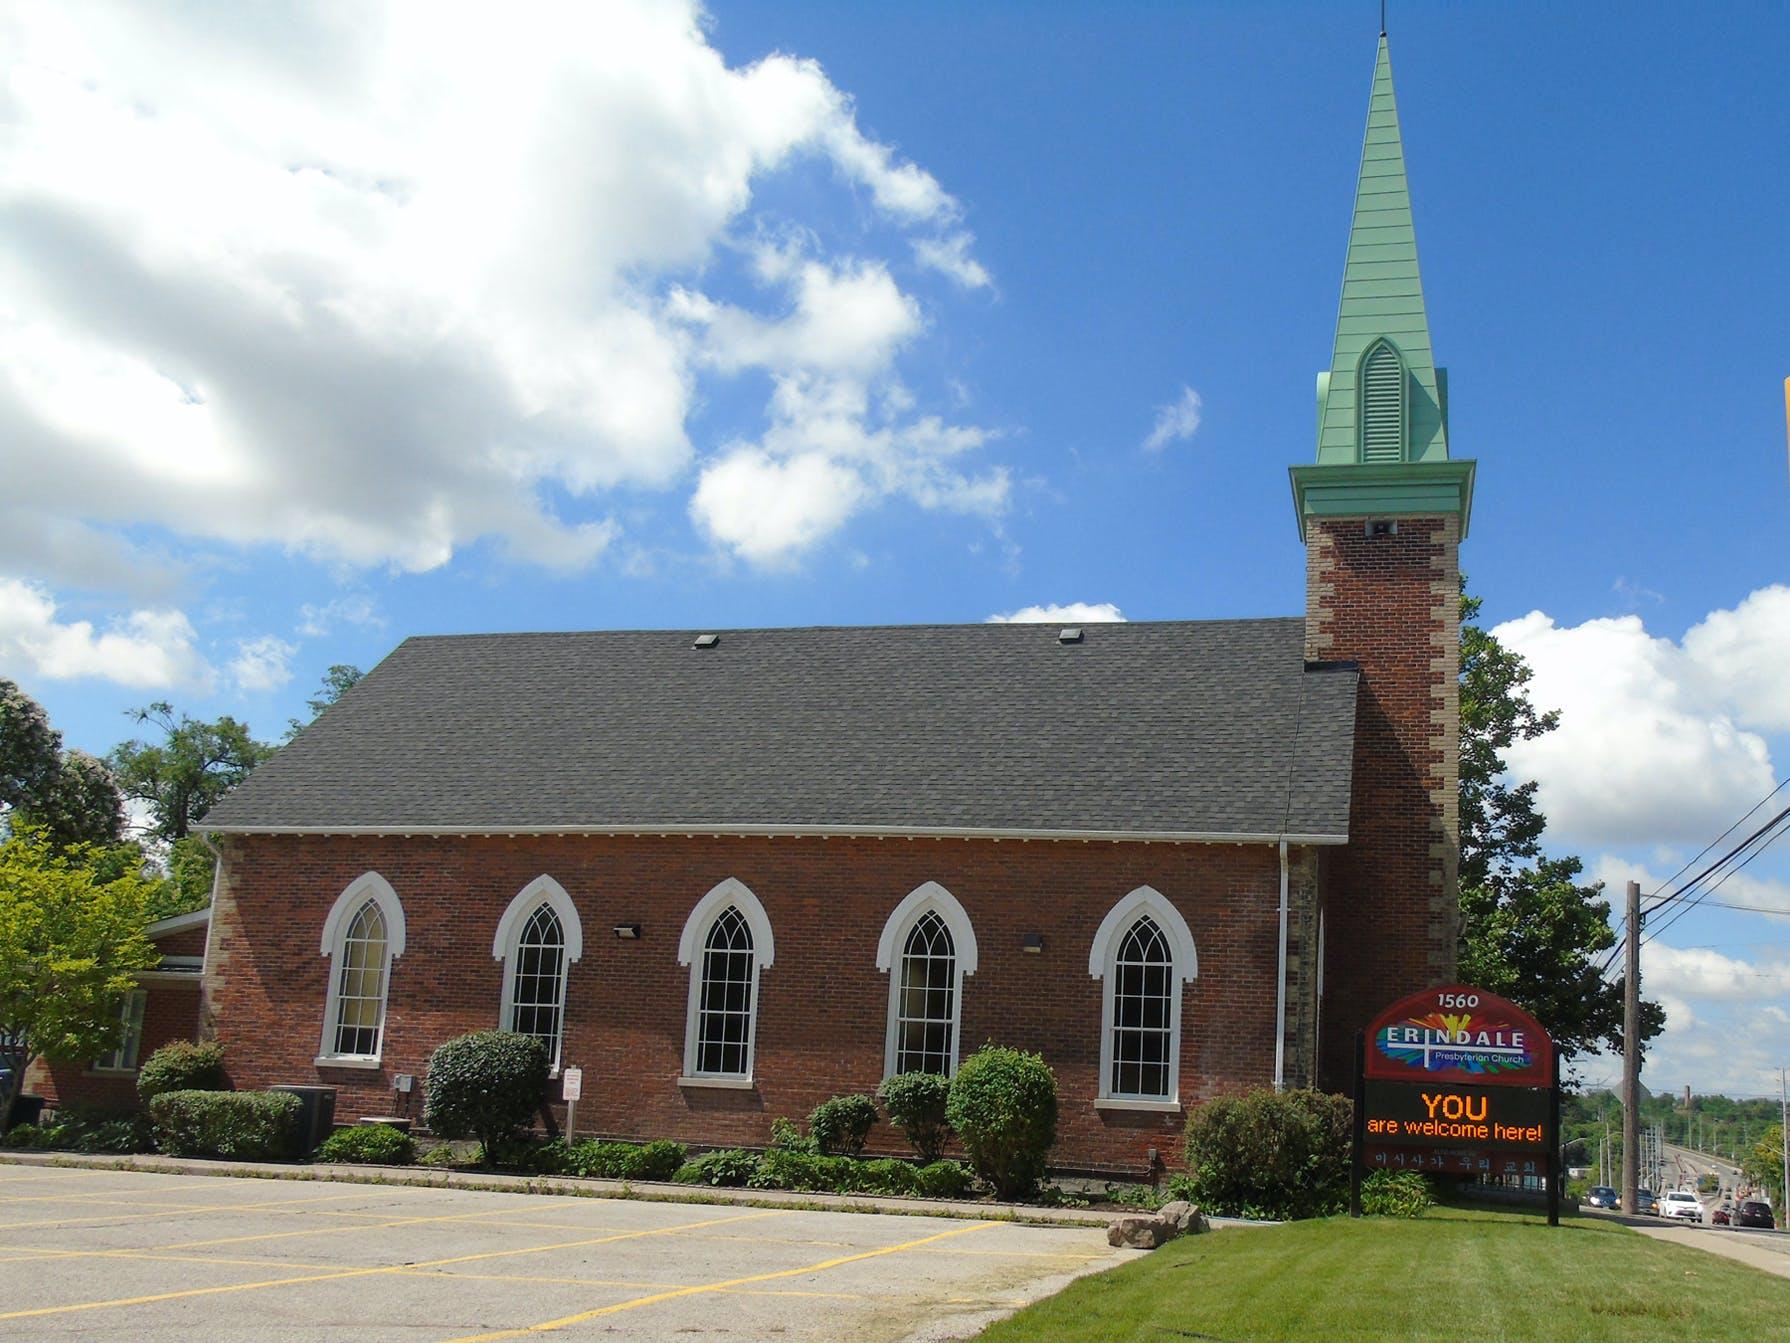 Erindale Presbyterian Church